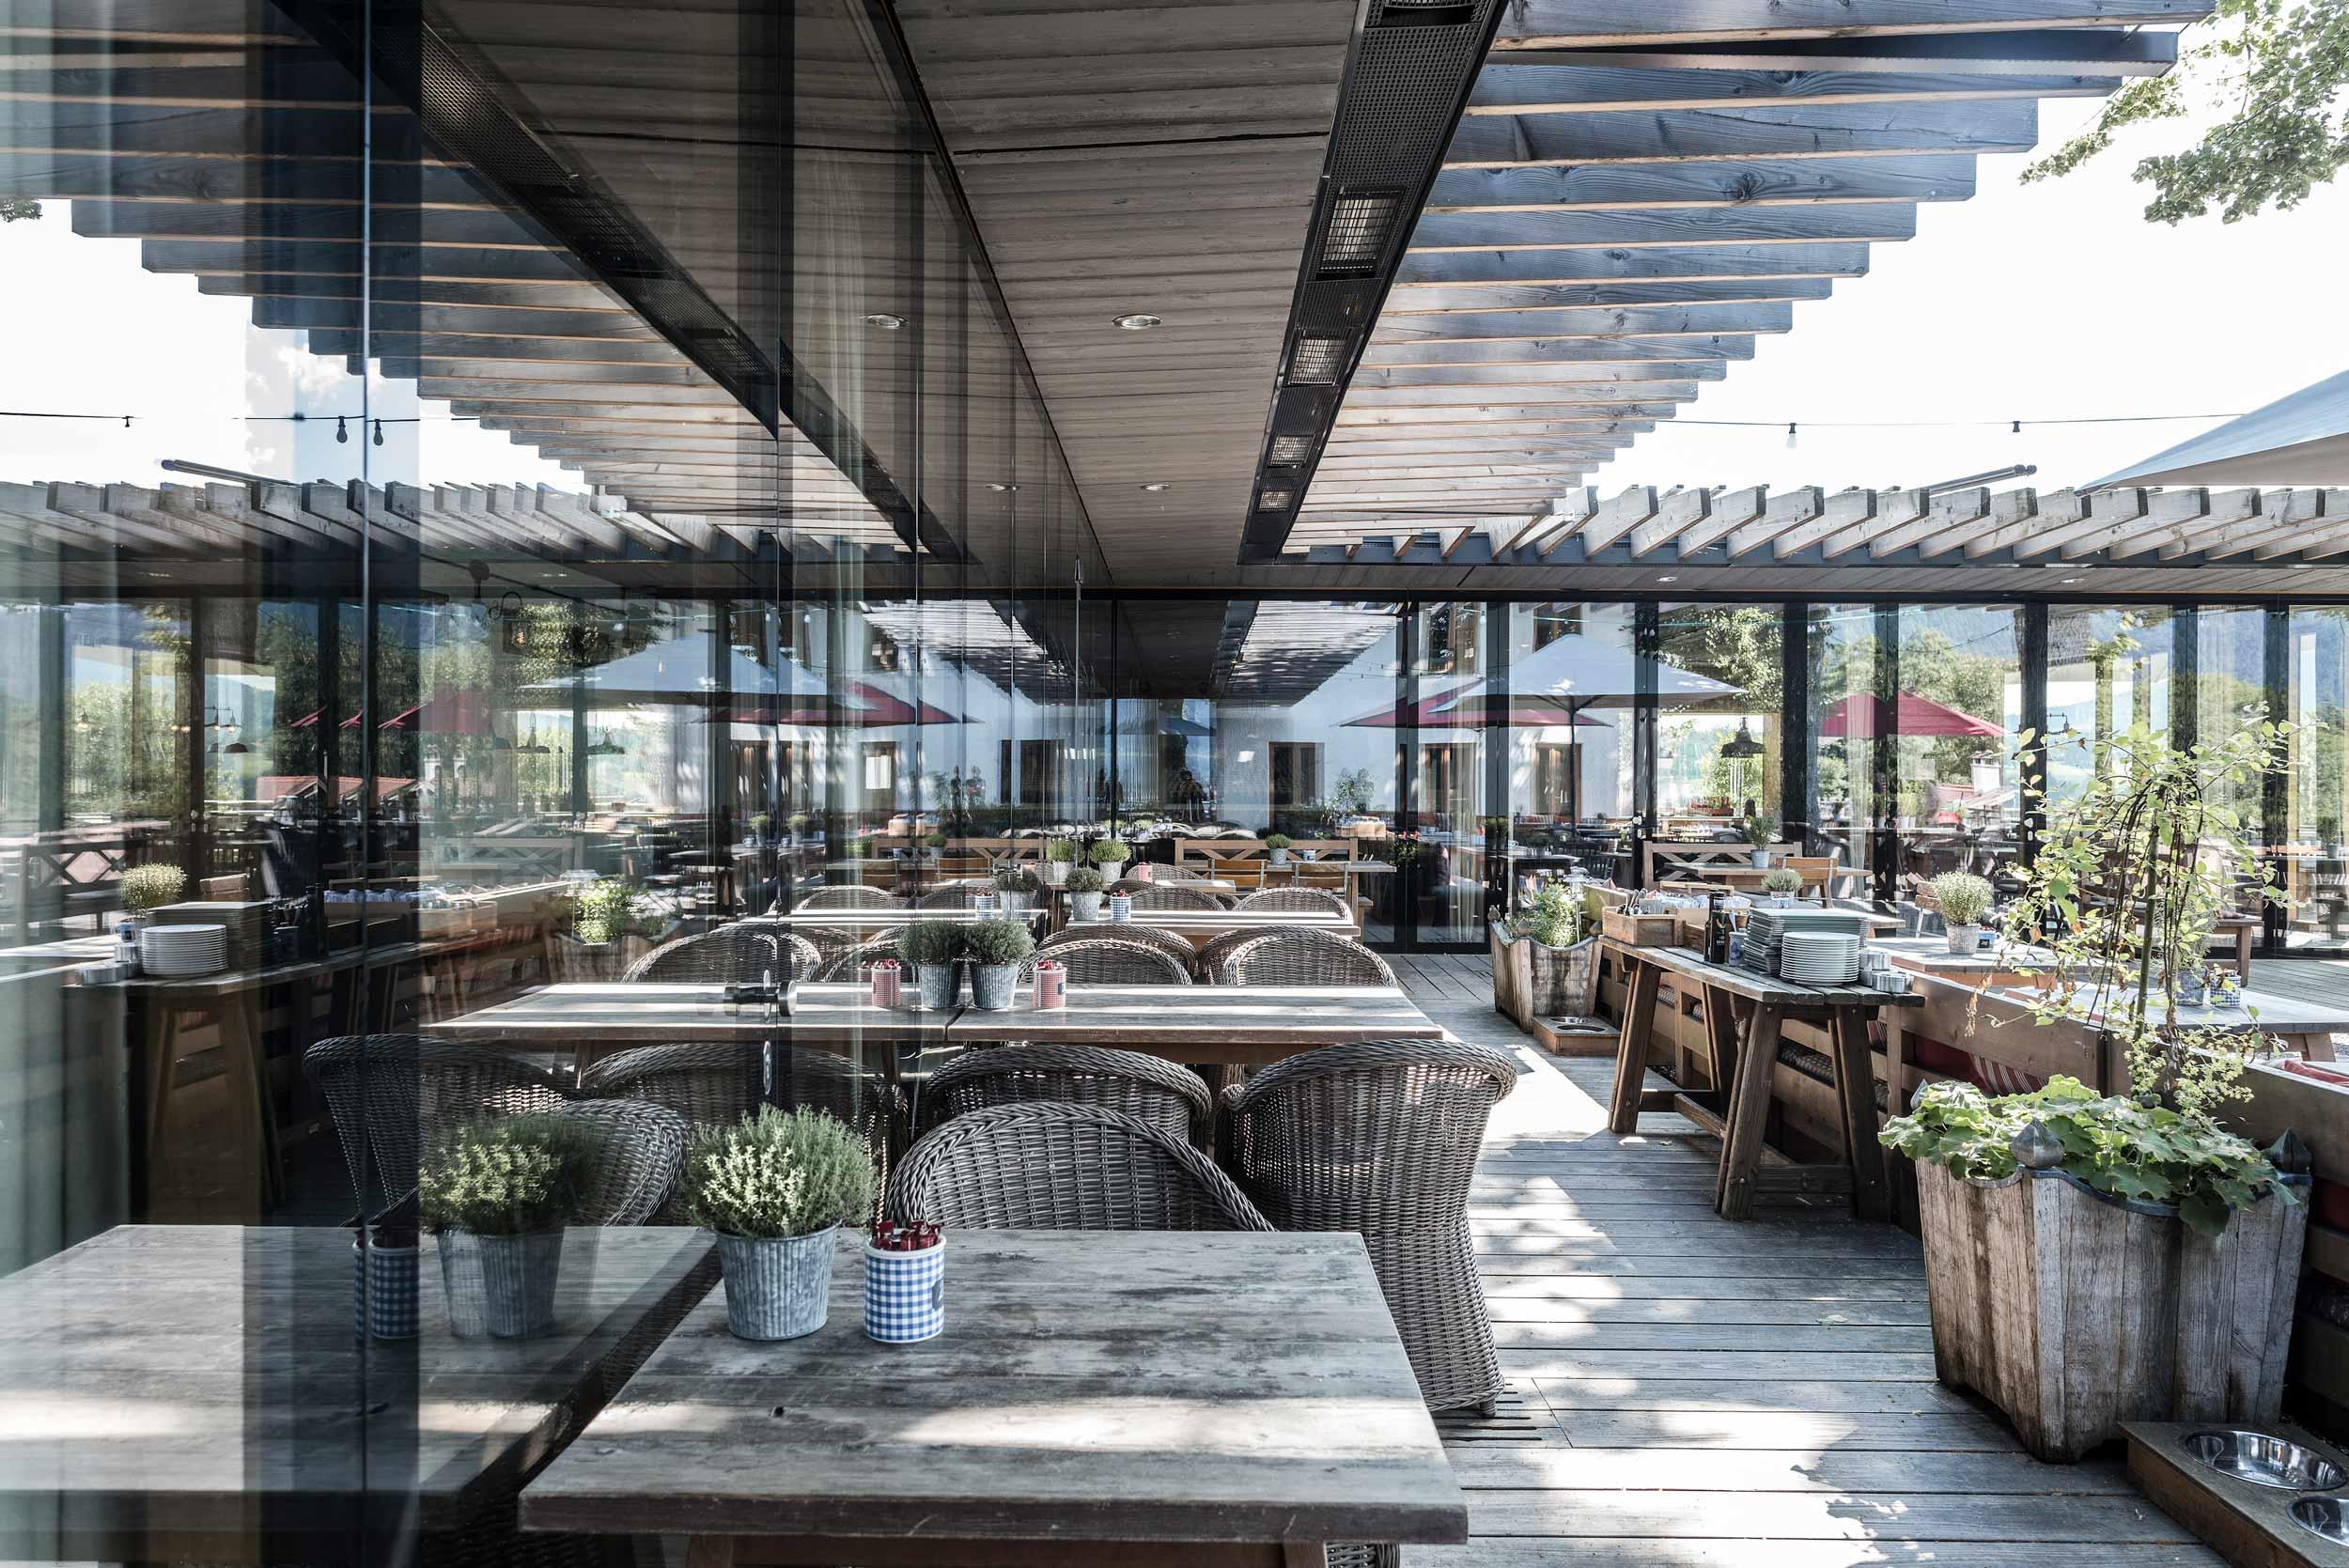 zimmerei-stoib-holzbau-holzhaus-gut-kaltenbrunn-tegernsee-festsaal-restaurant-fassade-sanierung-käfer-biergarten-terrasse-19.jpg